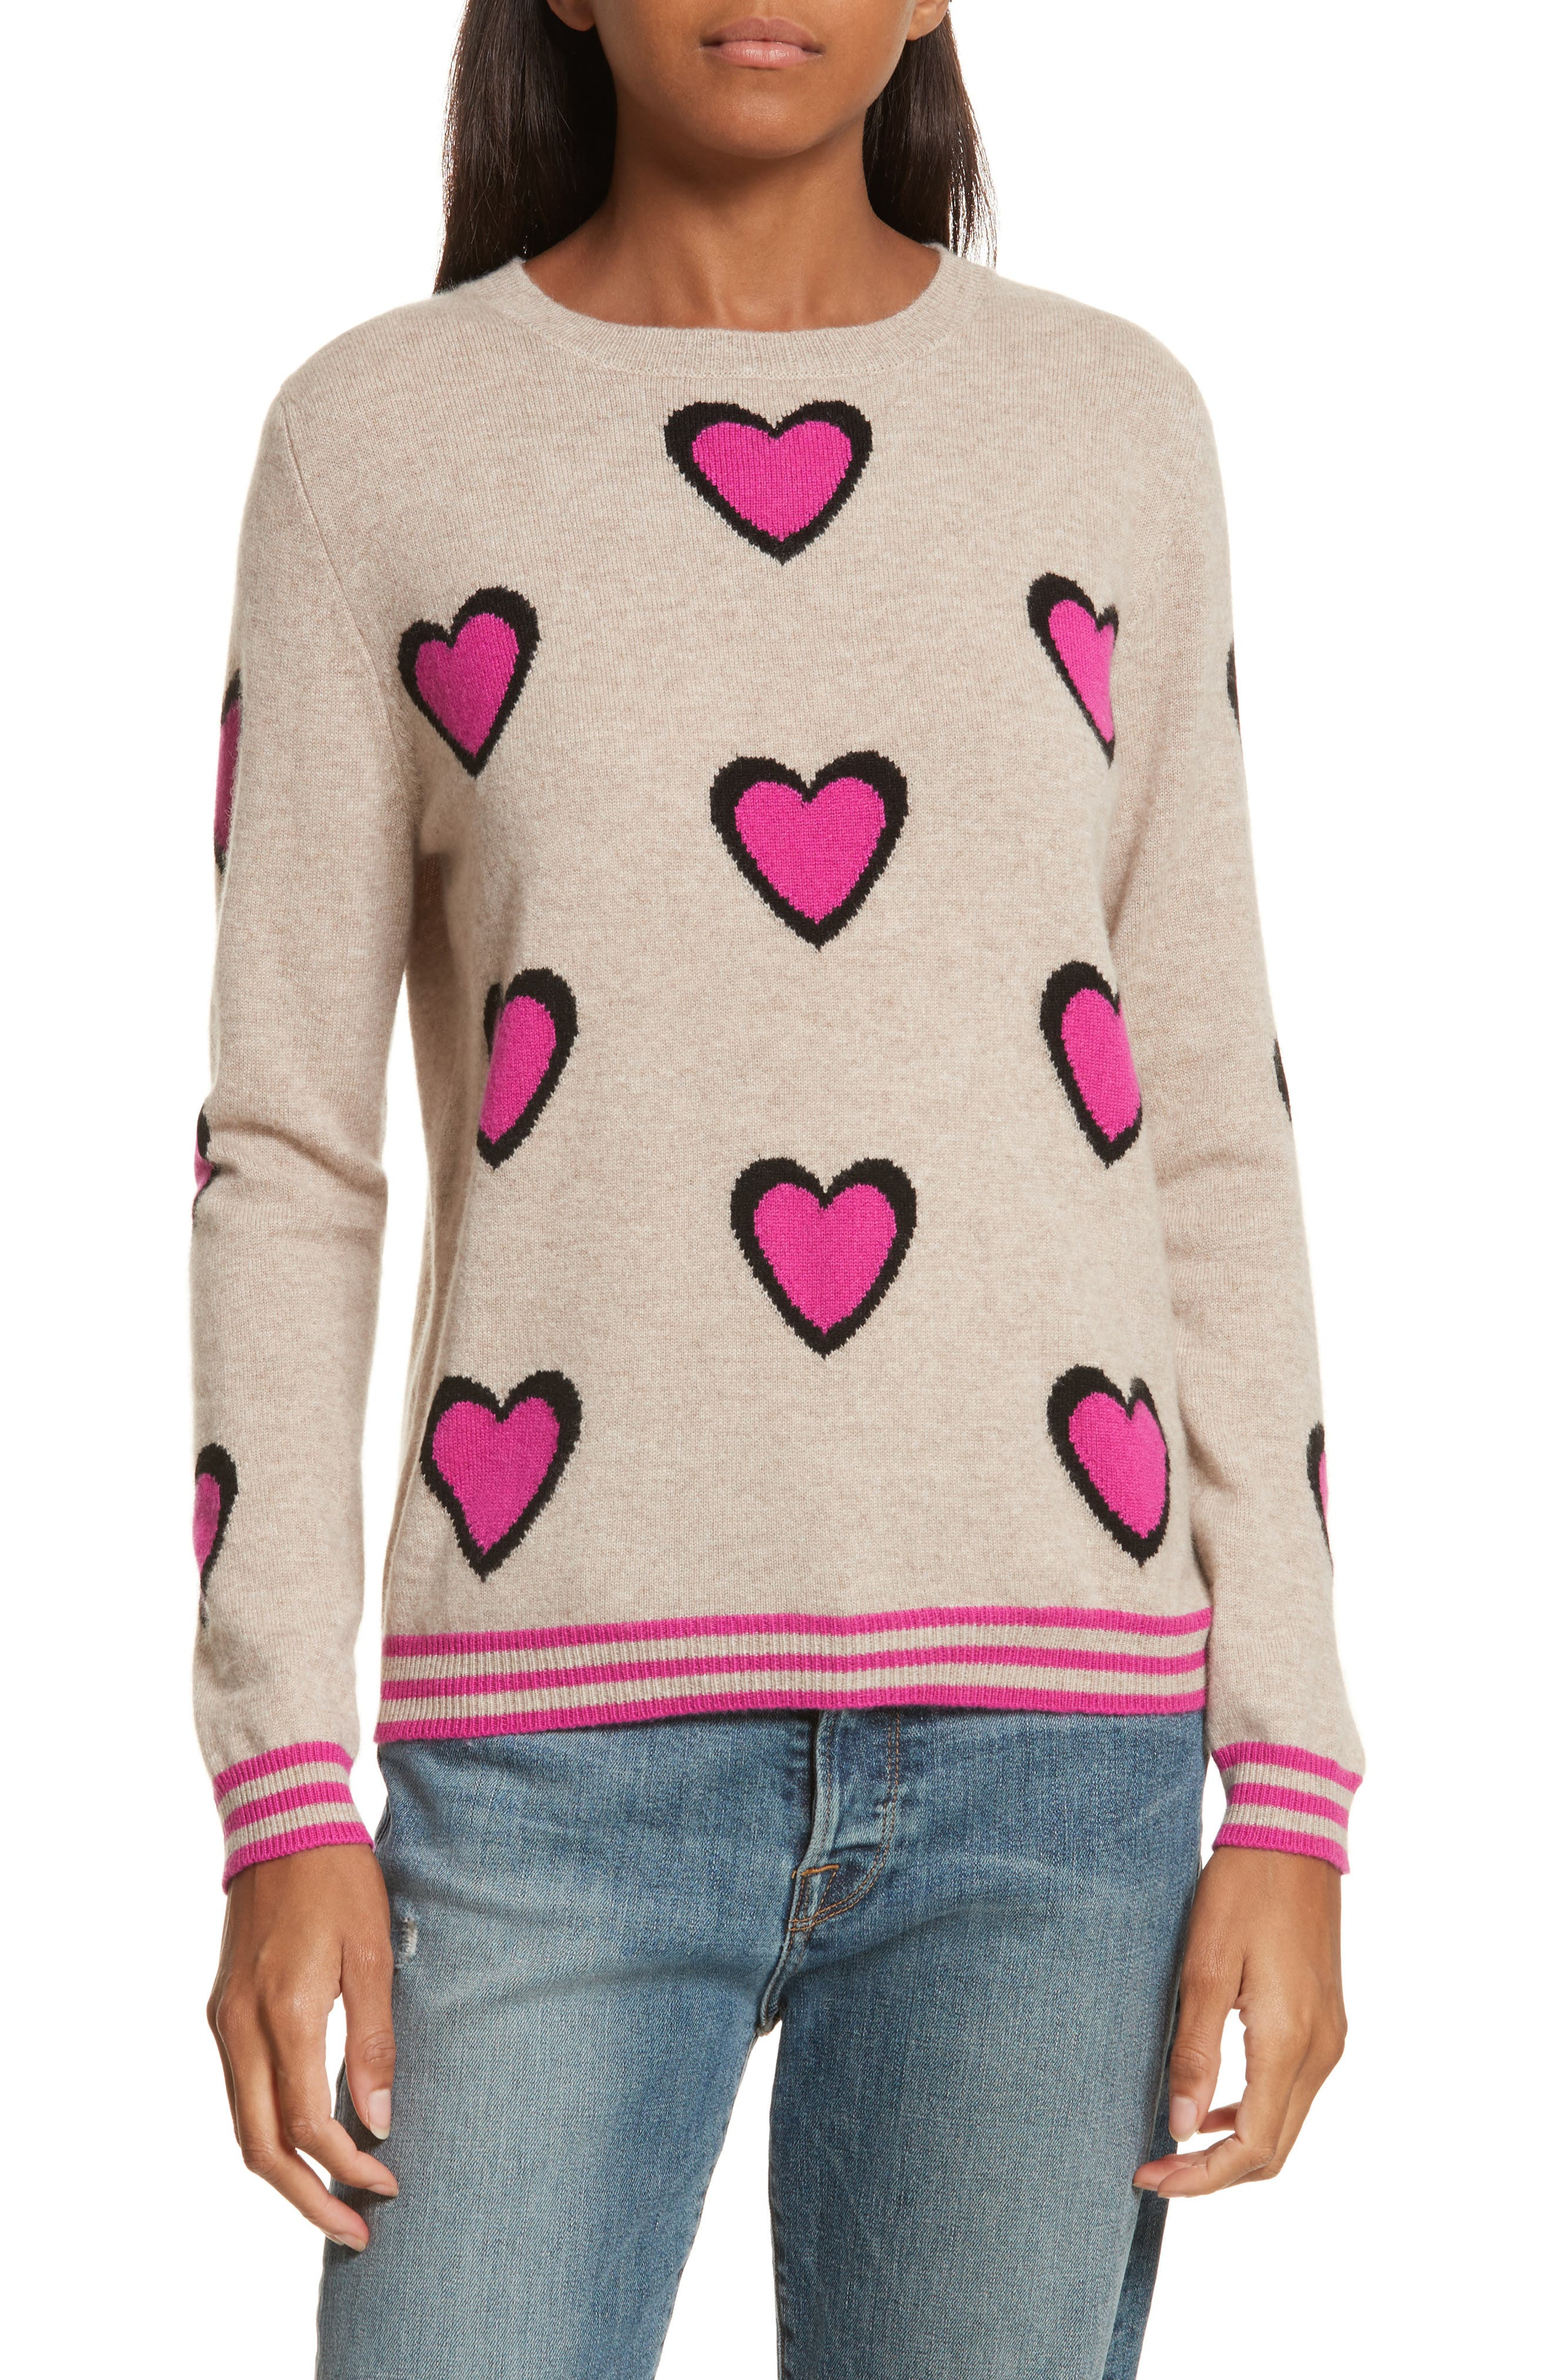 CHINTI & PARKER Heart Burst Cashmere Sweater,                             Main thumbnail 1, color,                             Oatmeal/ Black/ Fuchsia